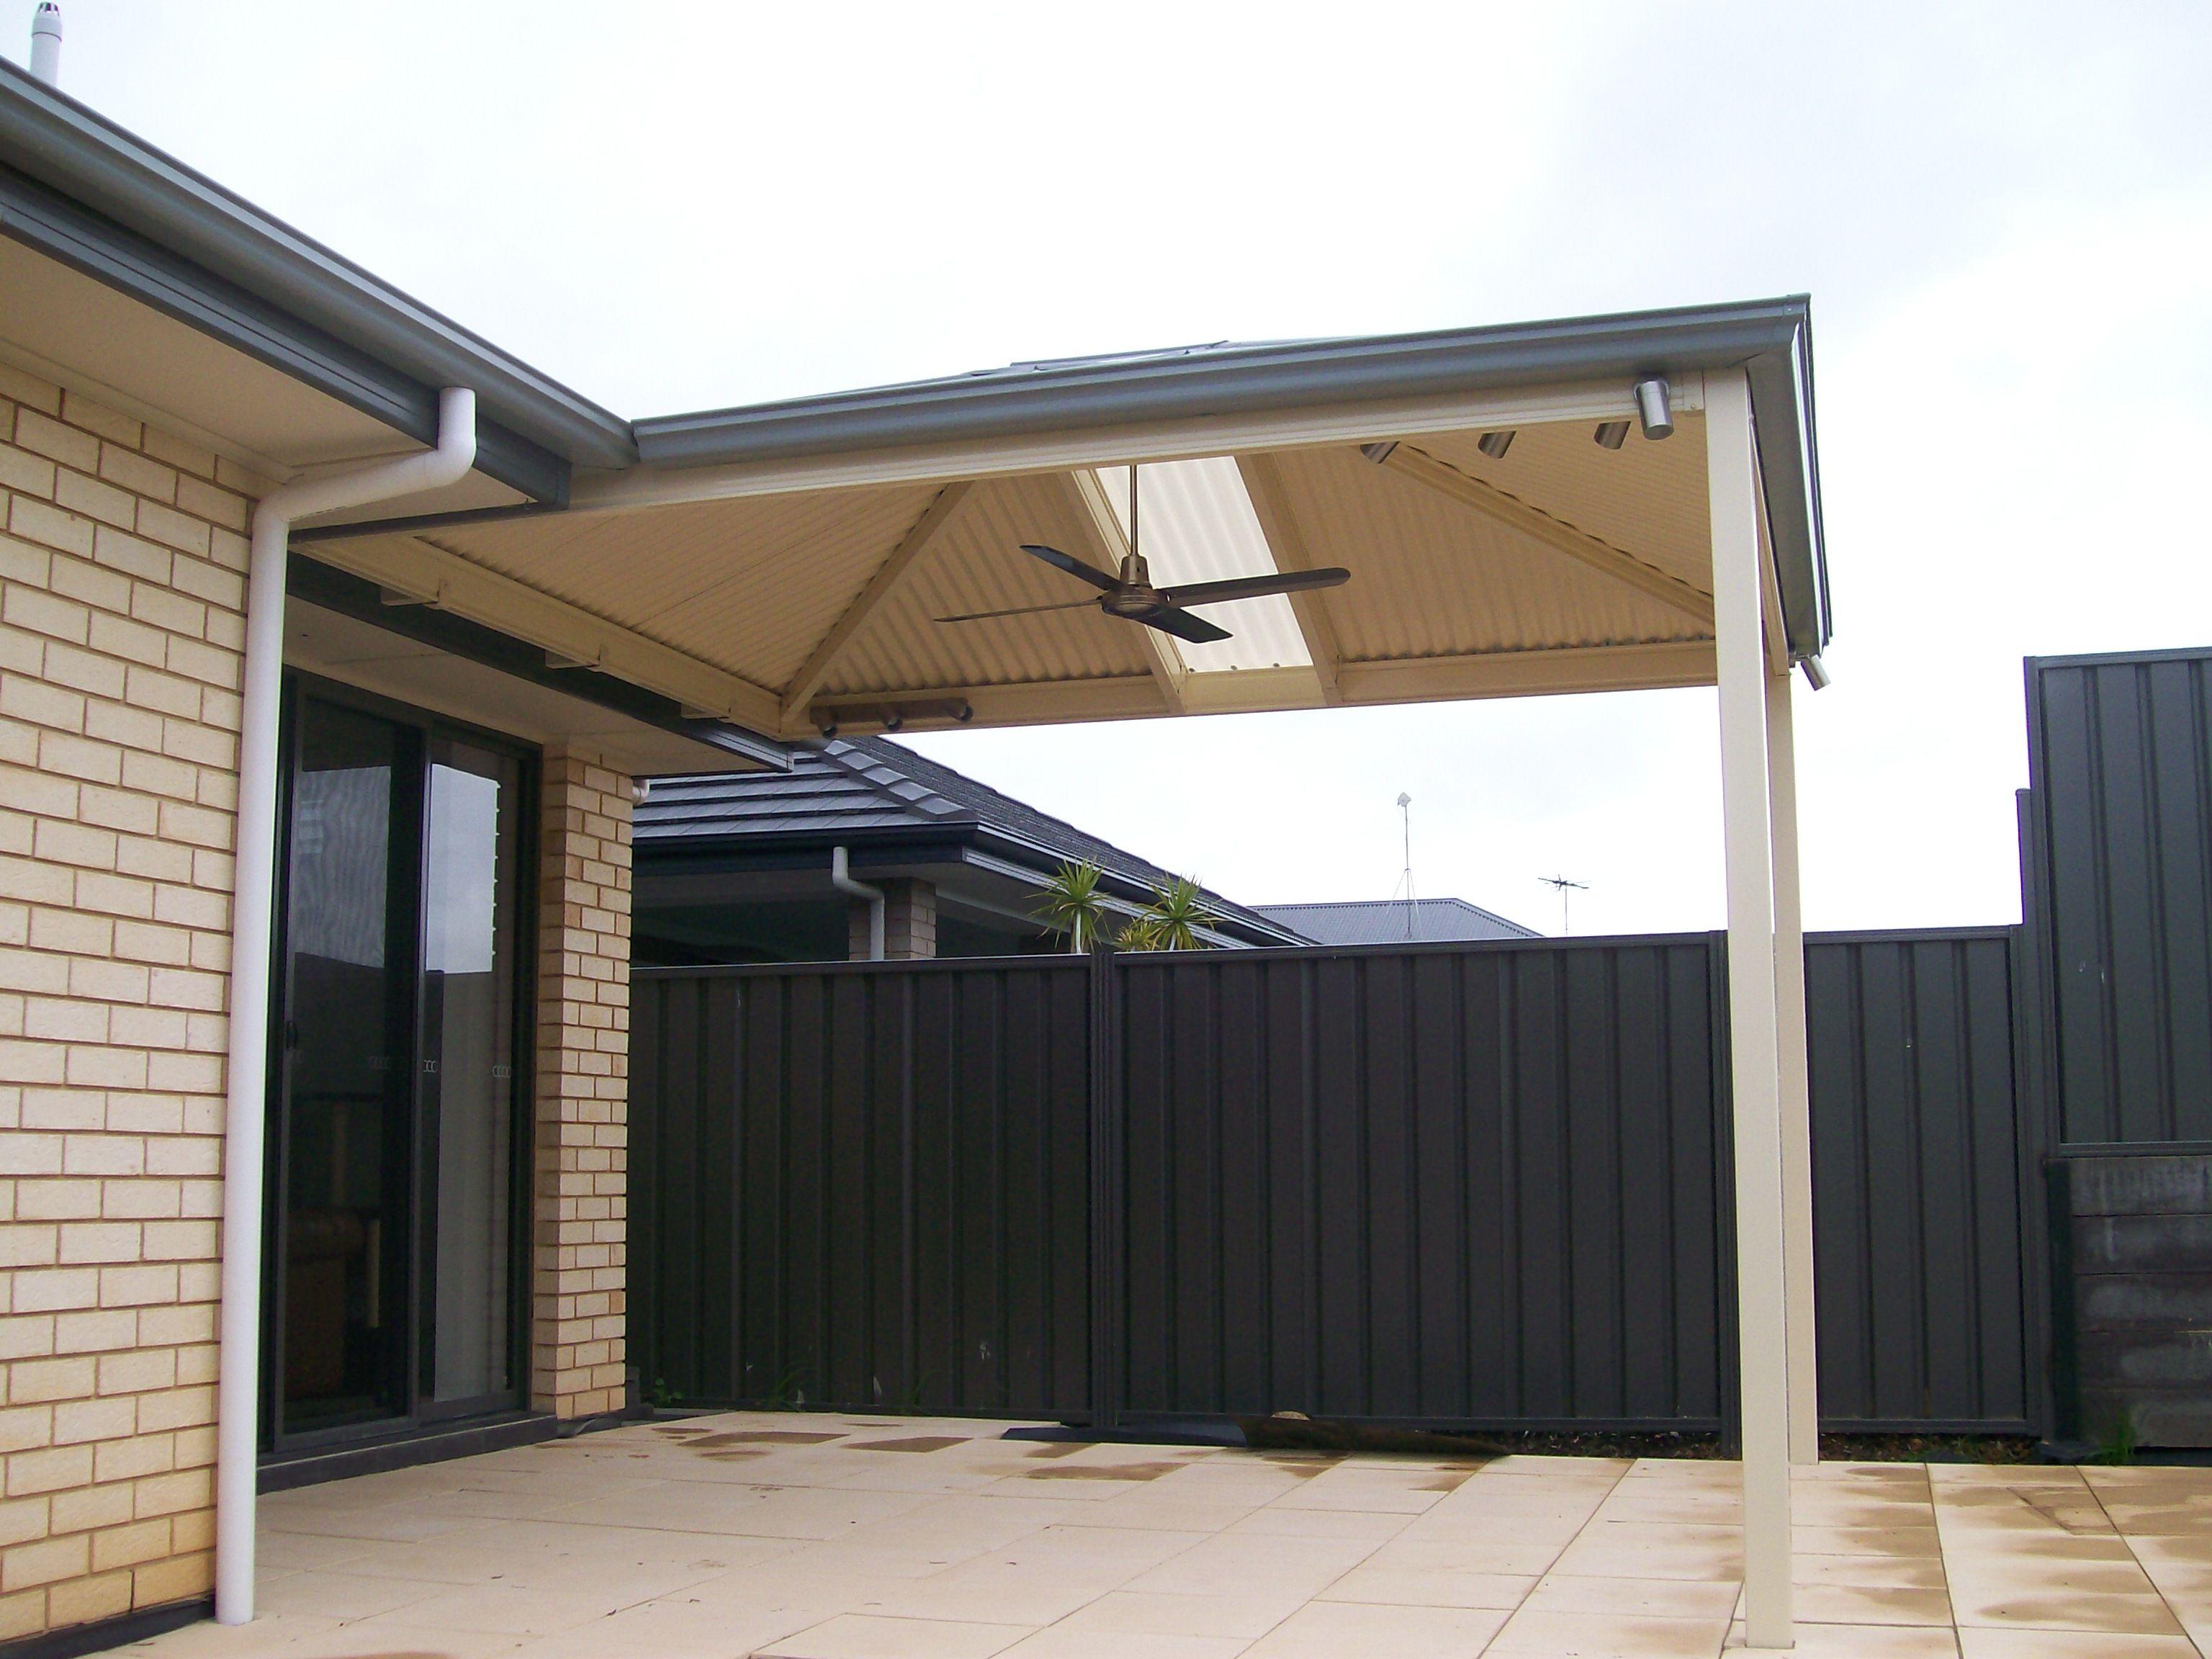 DMV pergola / patio designs hipped roof Carport patio